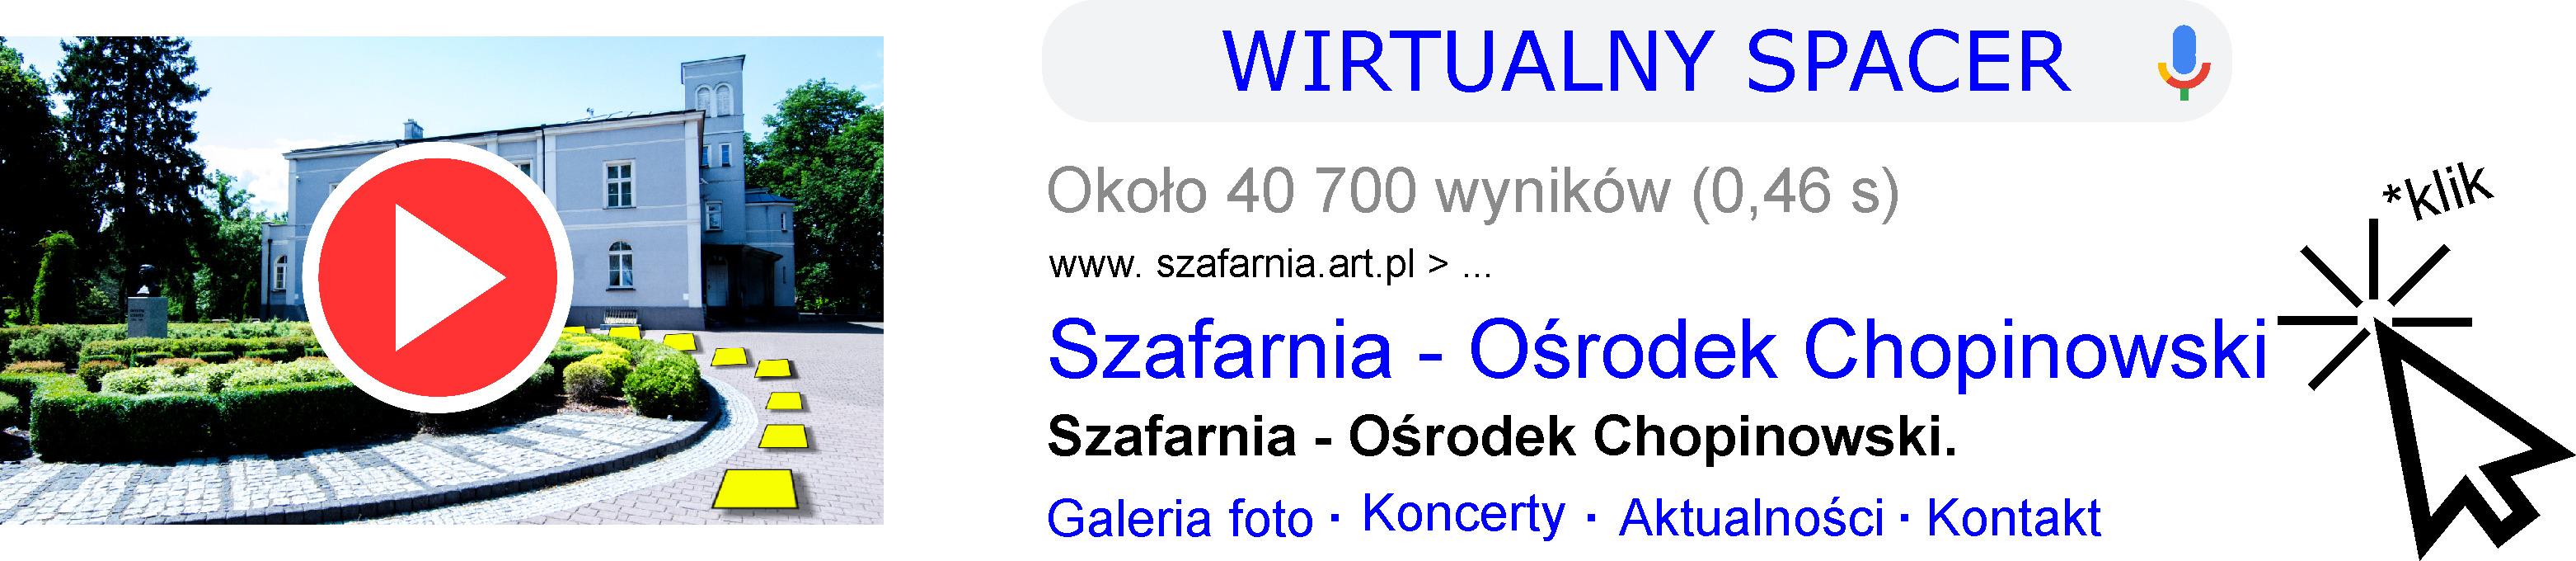 WIRTUALNY SPACER PO SZAFARNI